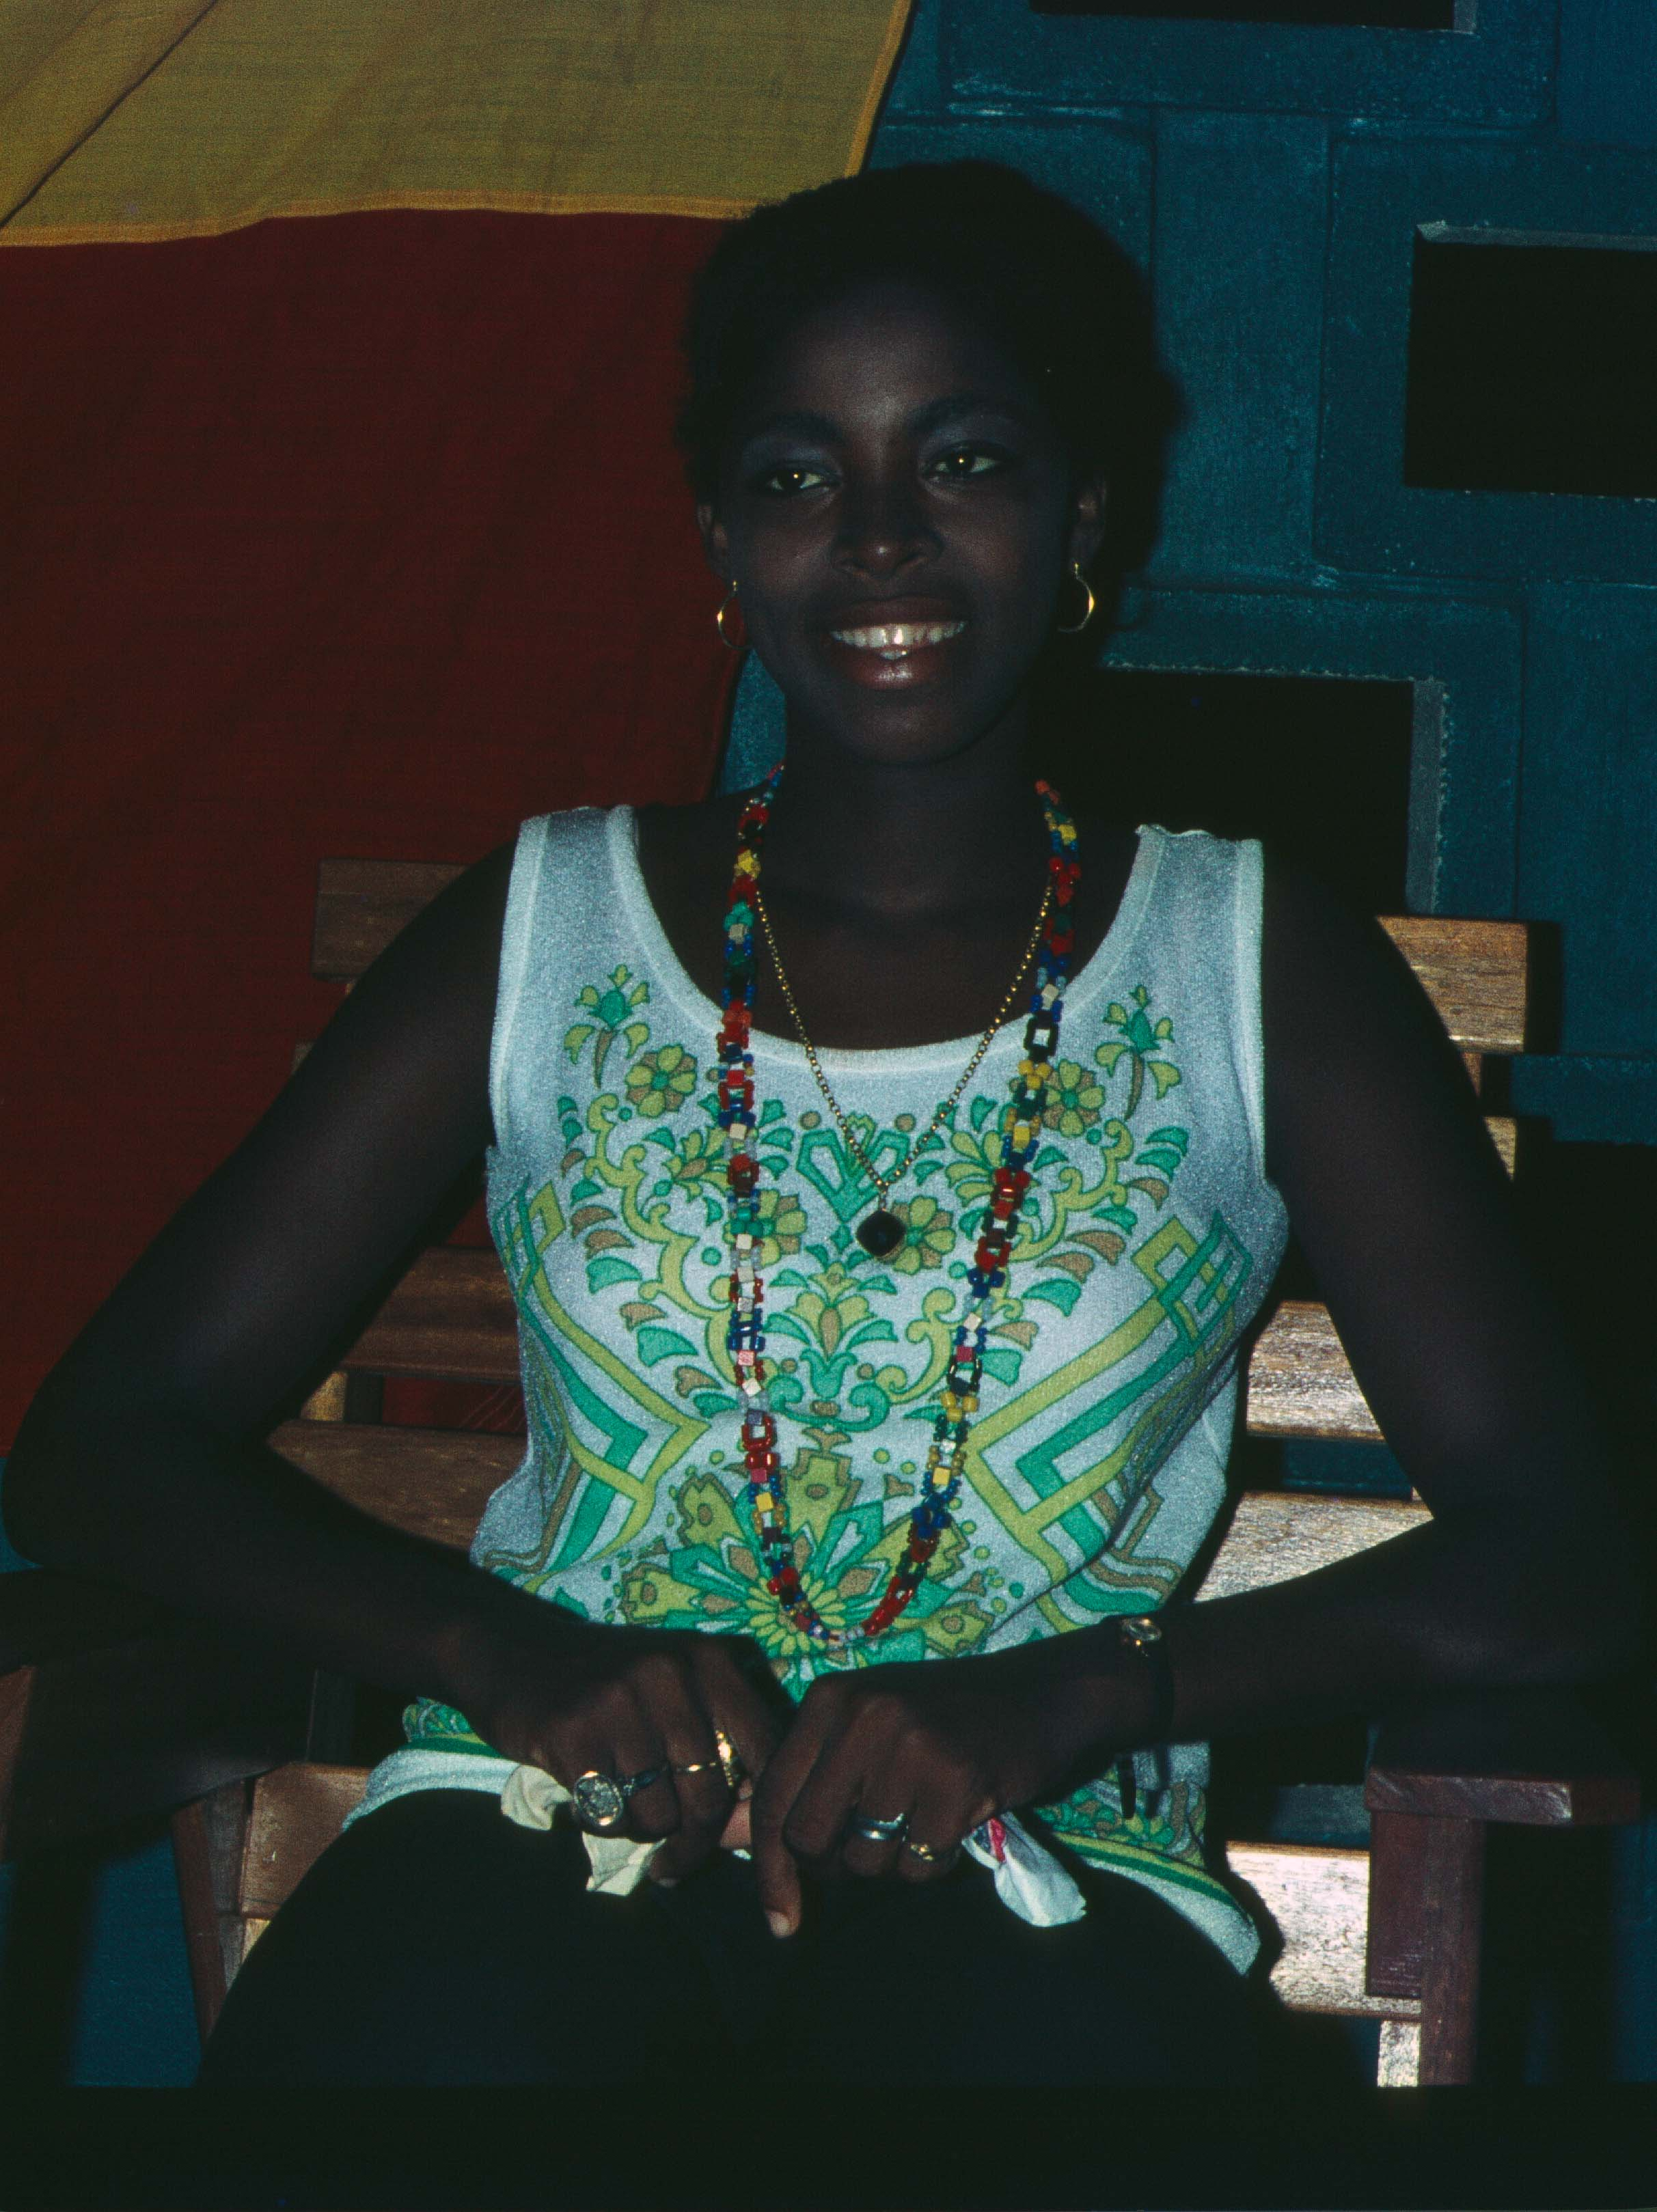 318. Suriname